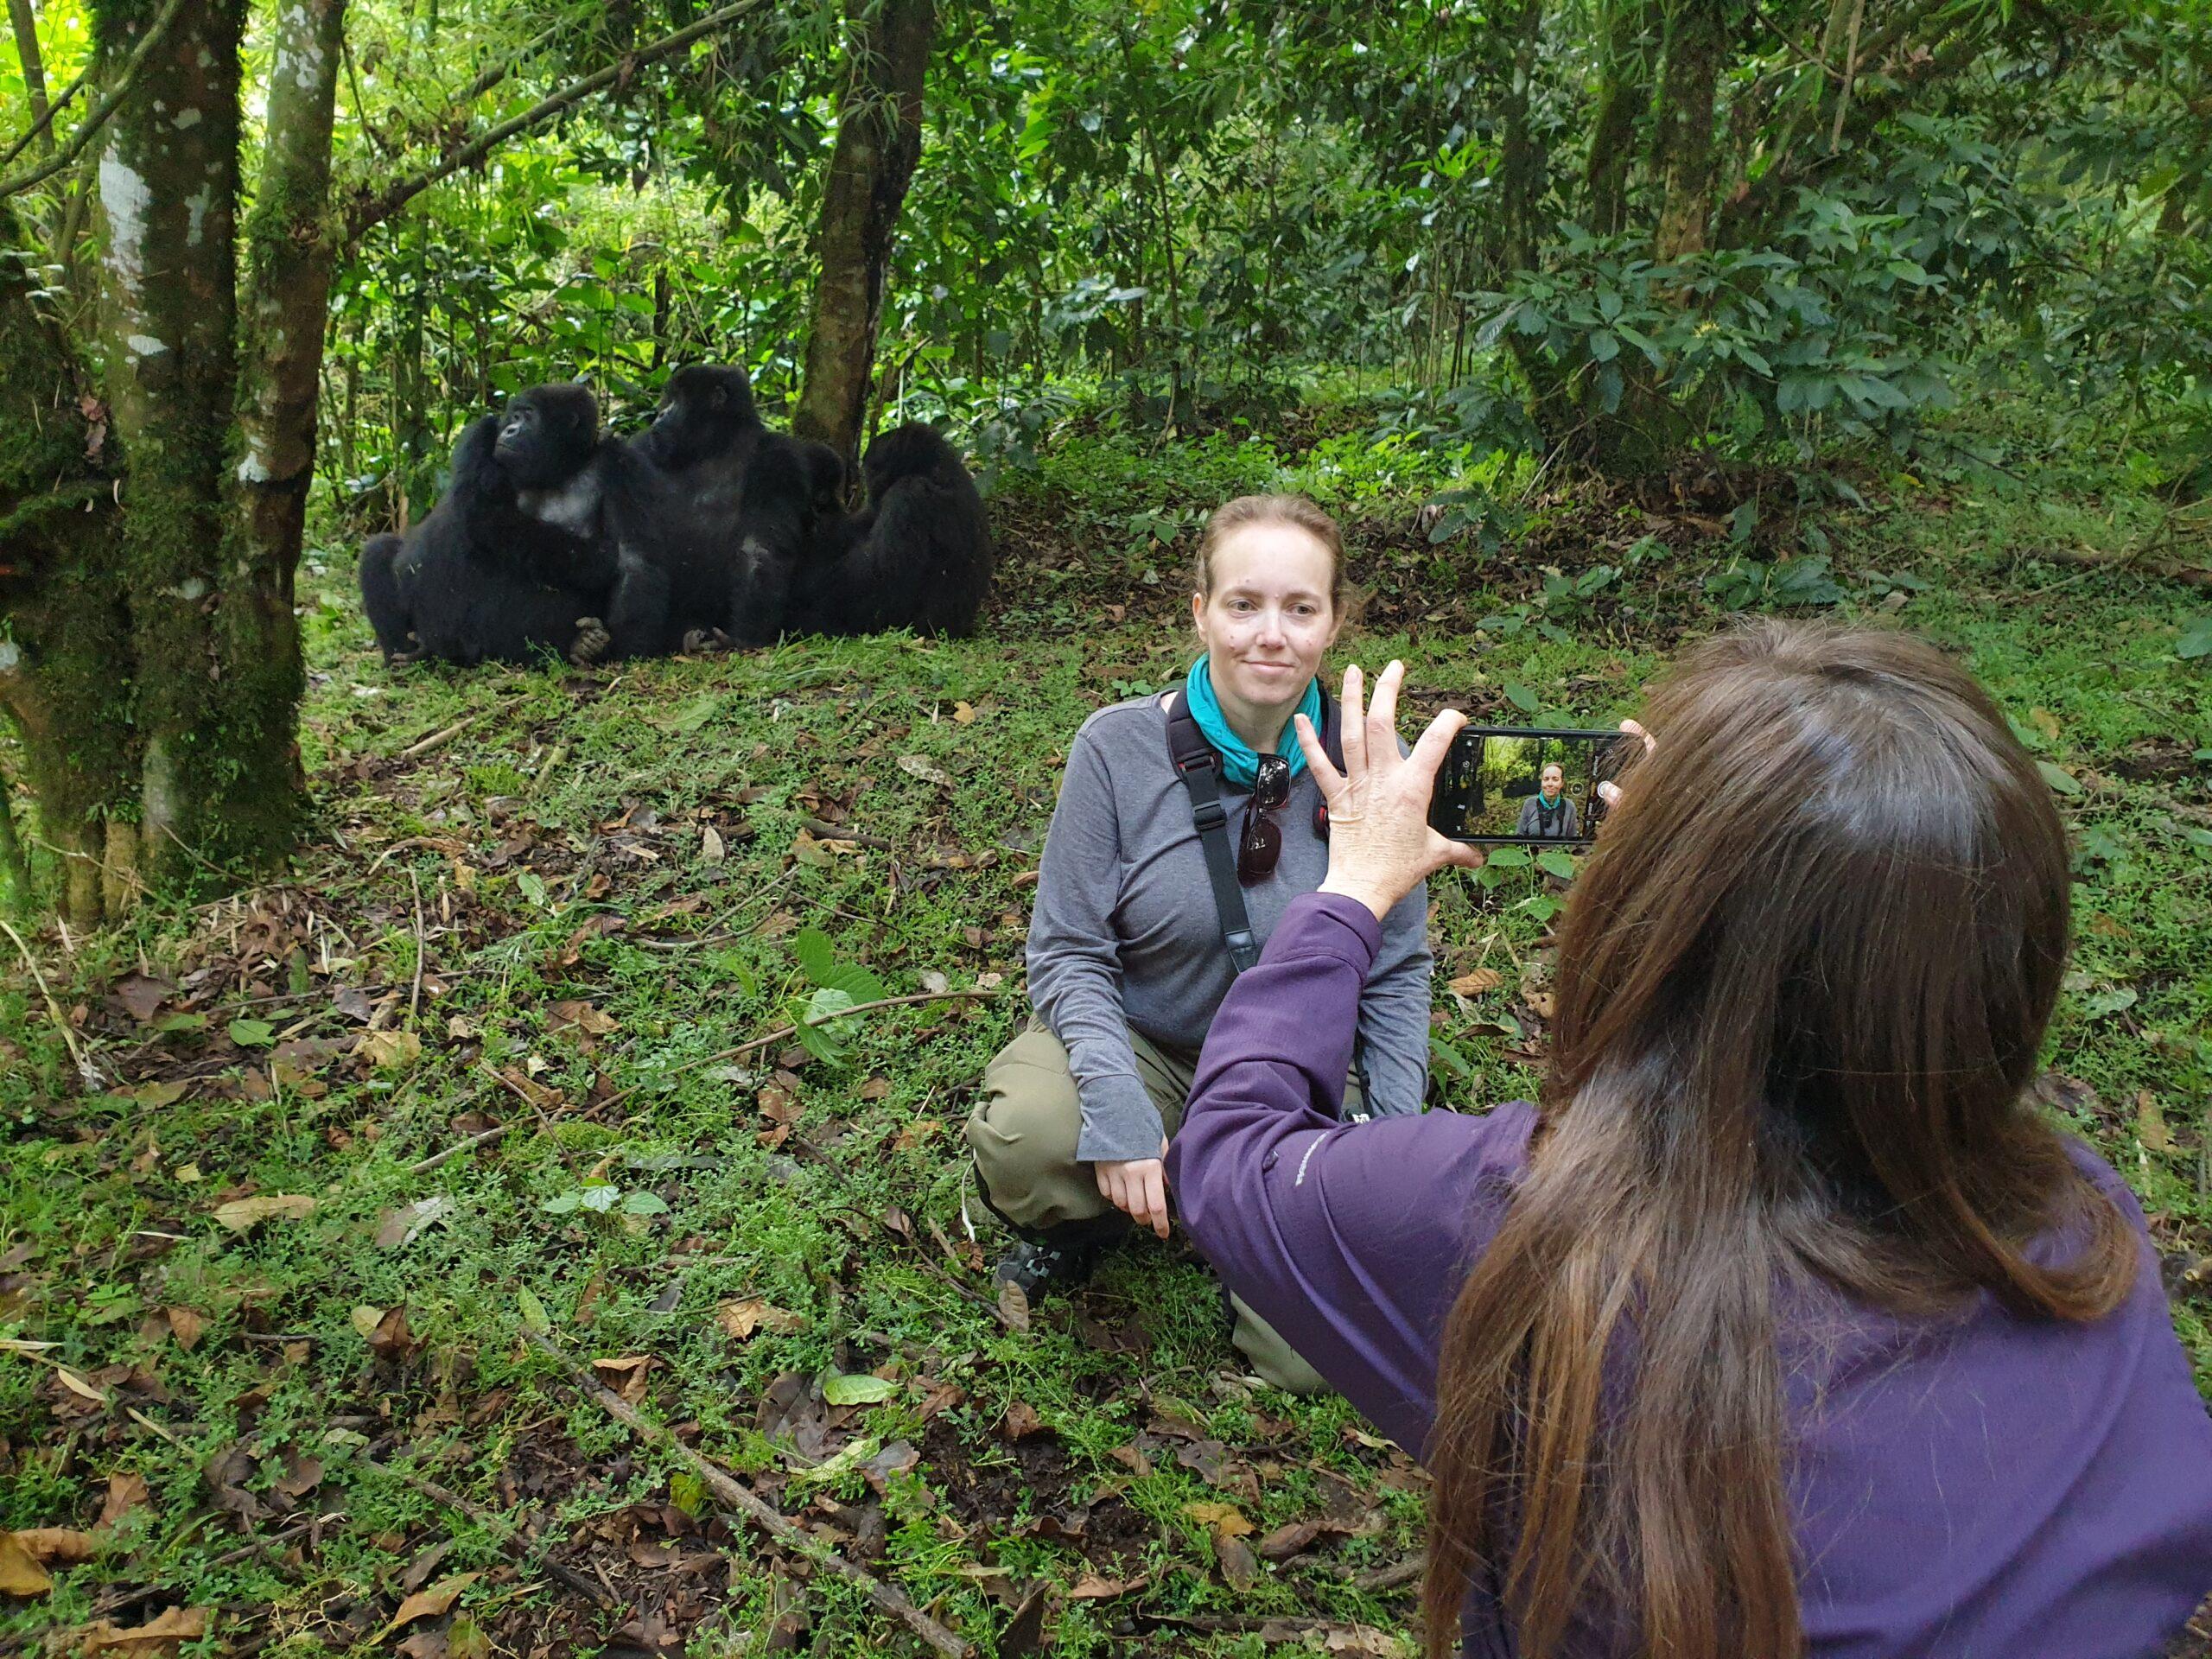 Photo opp with gorillas